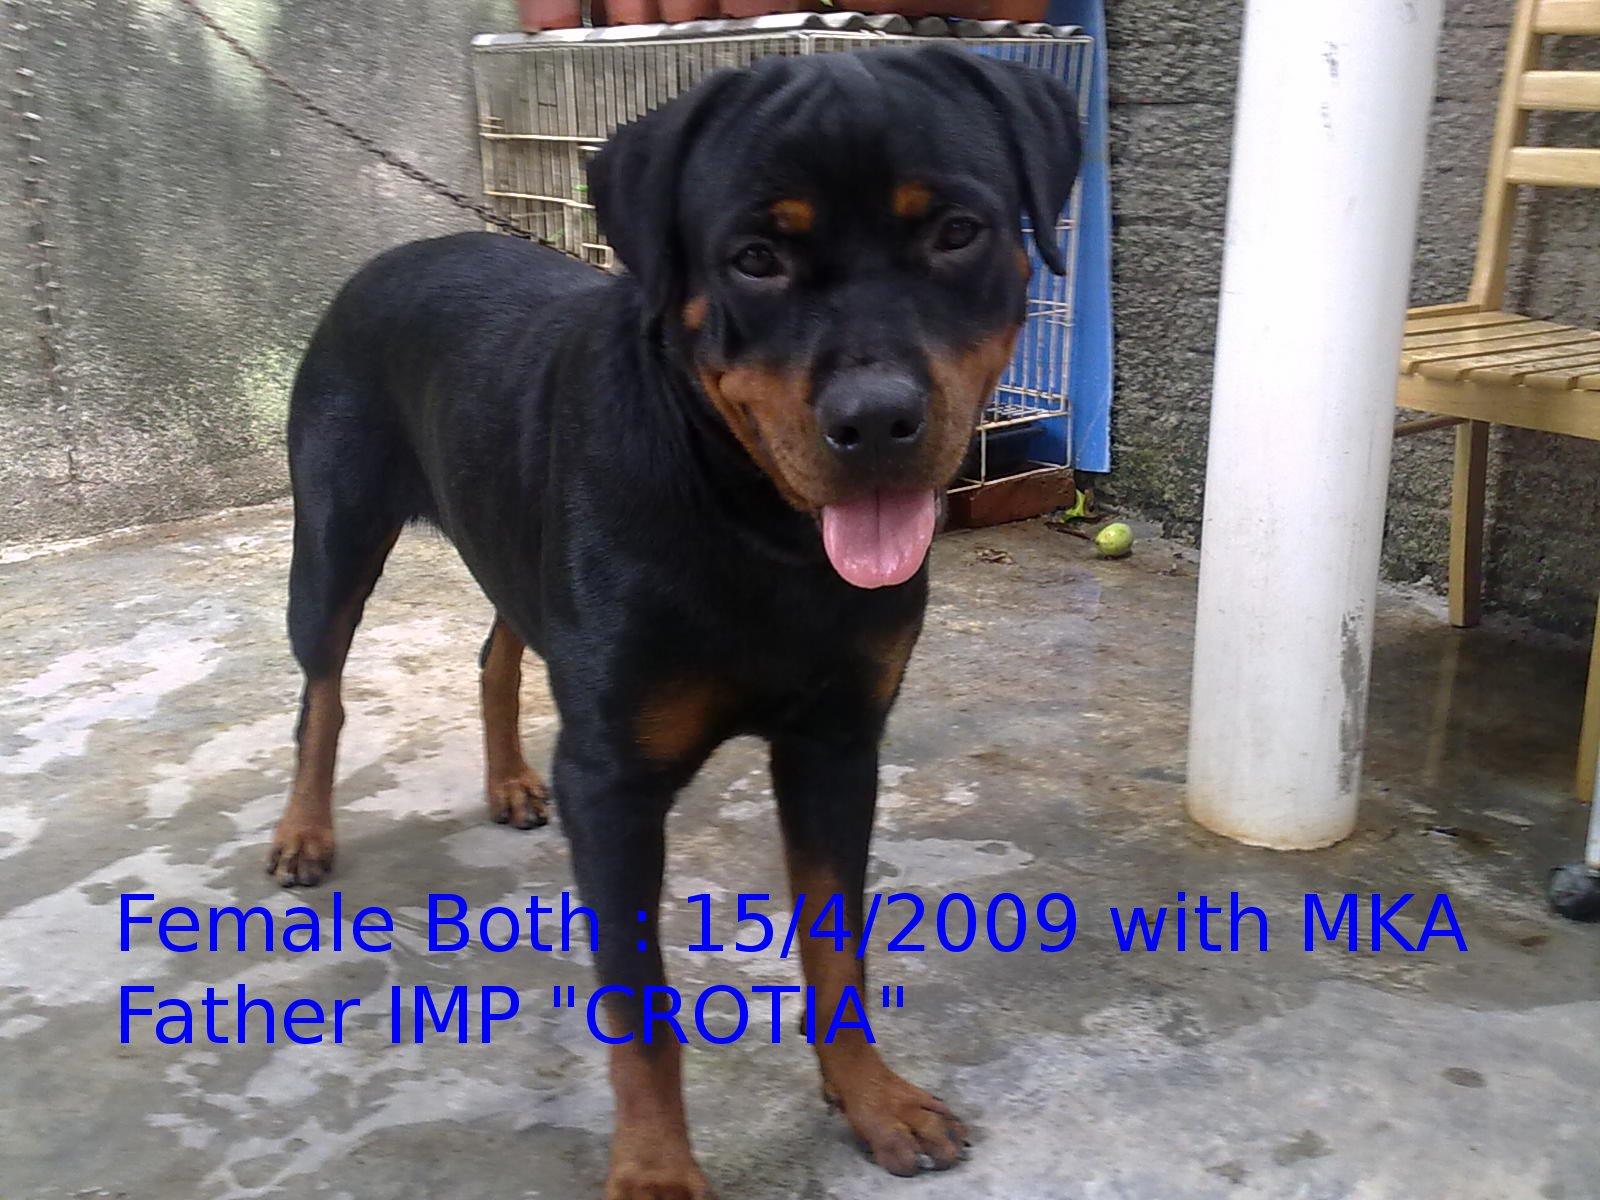 Adult Rottweiler Female MKA for Sale  5b06e538b8